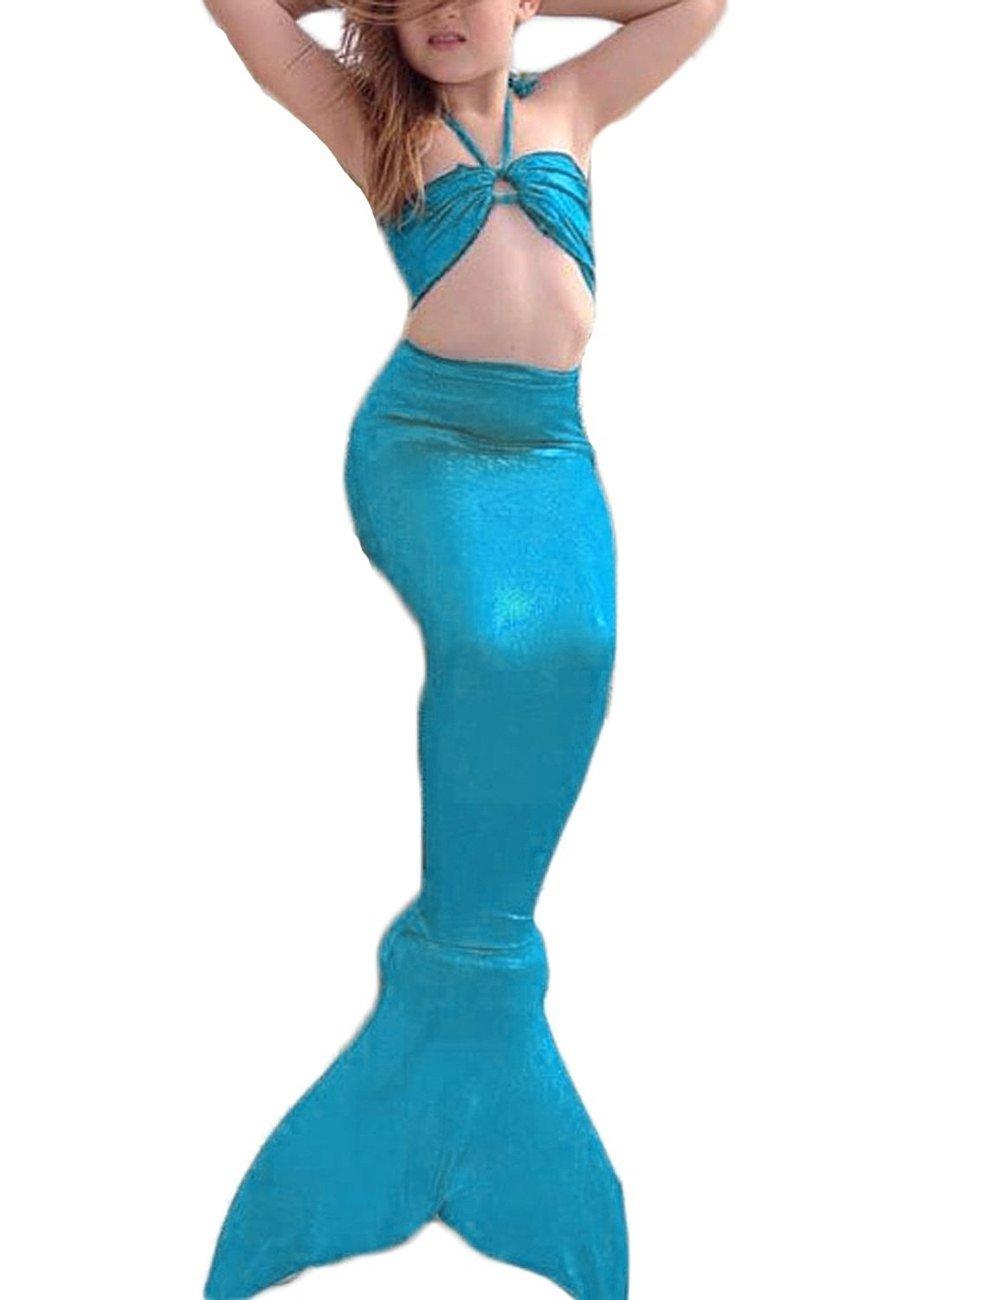 LBXX 3Pcs Mermaid Tail for Girls Swimming Swimsuits Princess Bikini Set for Toddler Big Girls Birthday Gift,3-14 Years